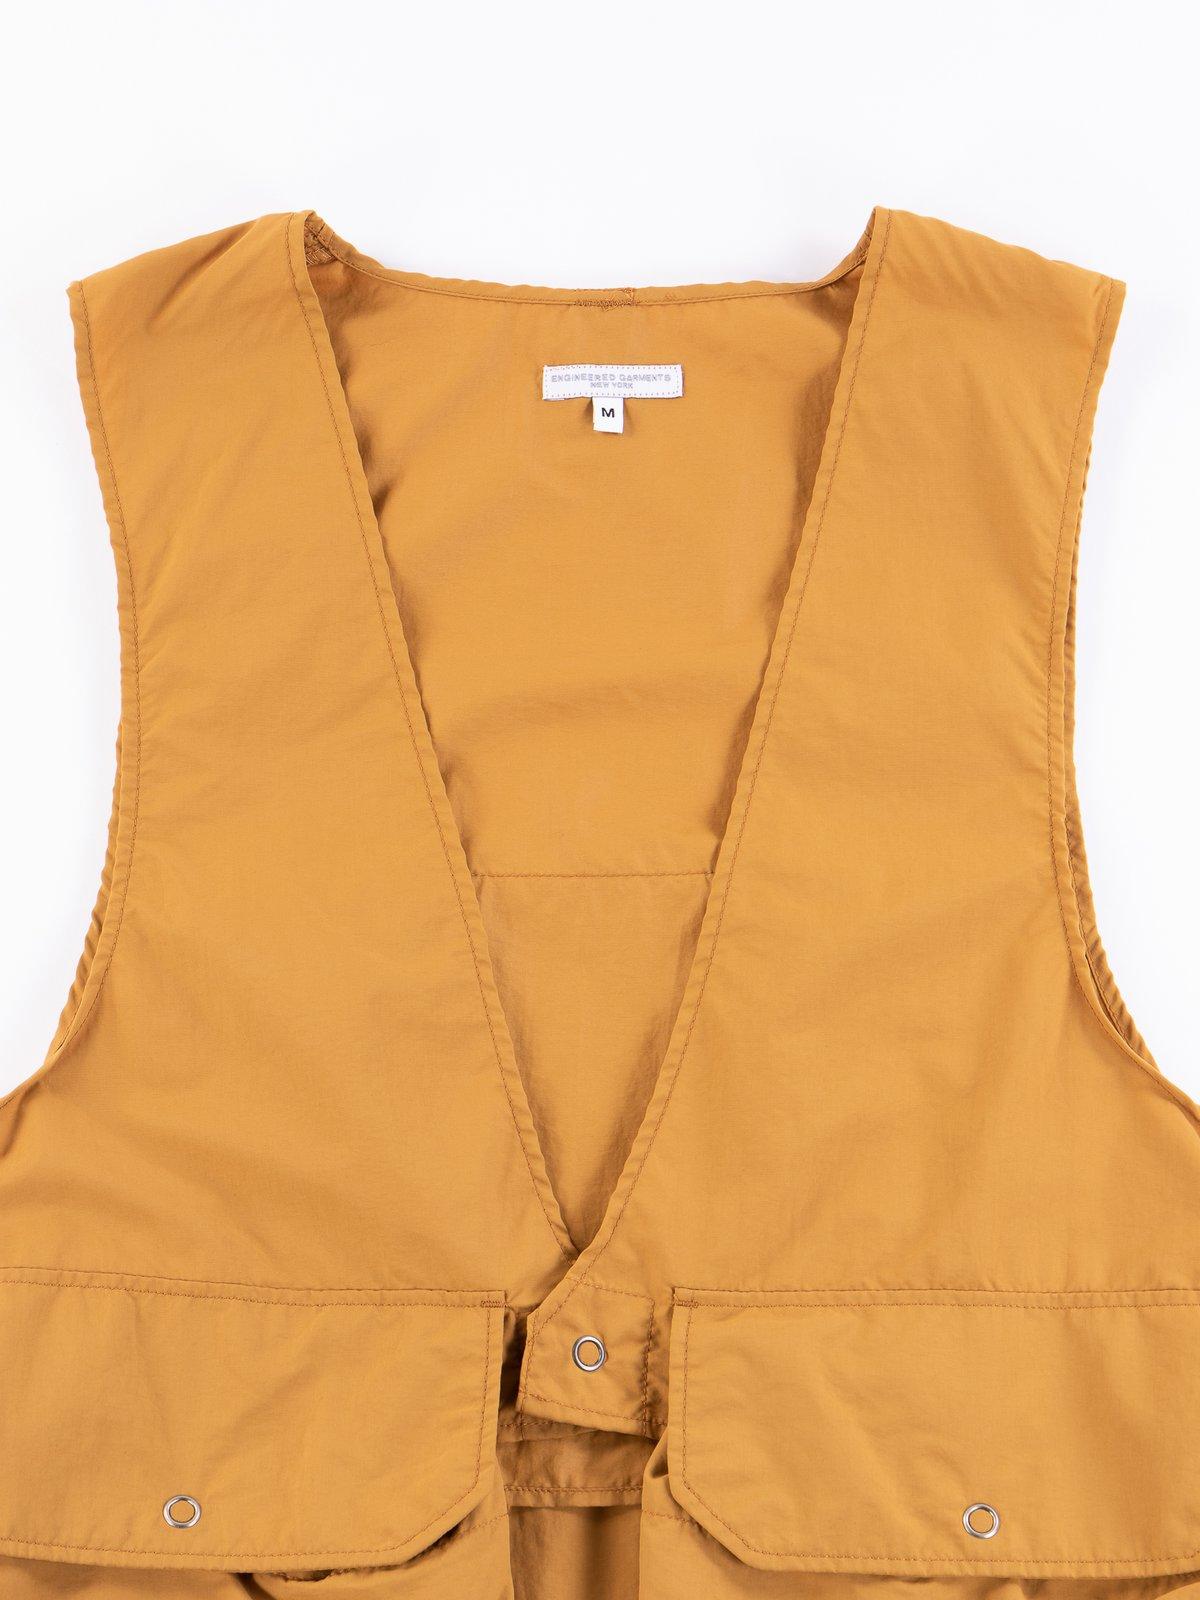 Mustard Acrylic Coated Nylon Taffetta Fowl Vest - Image 3